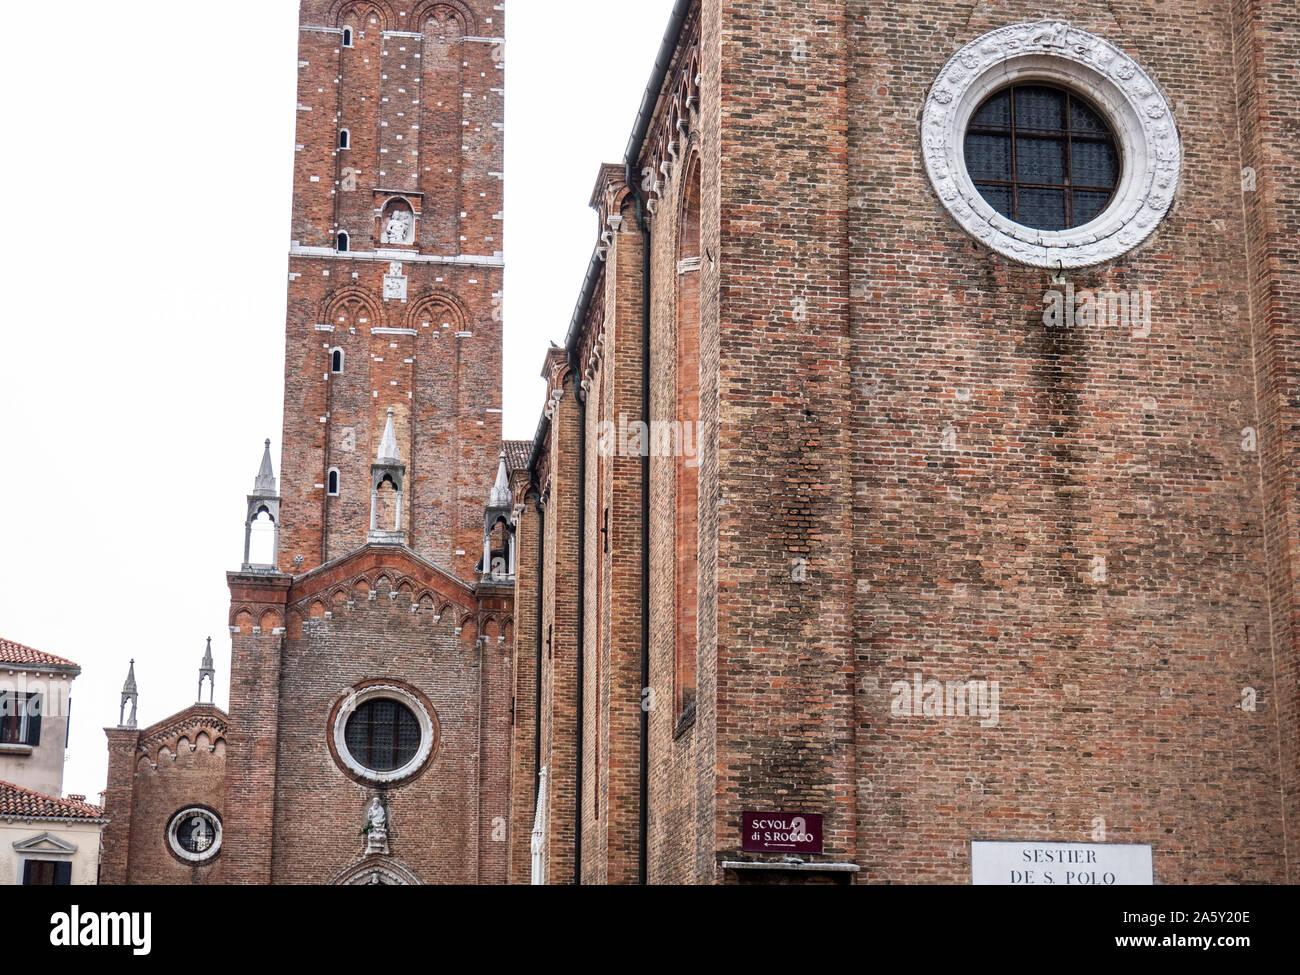 Italie, Vénétie, Venise, Santa Maria Gloriosa dei Frari Banque D'Images